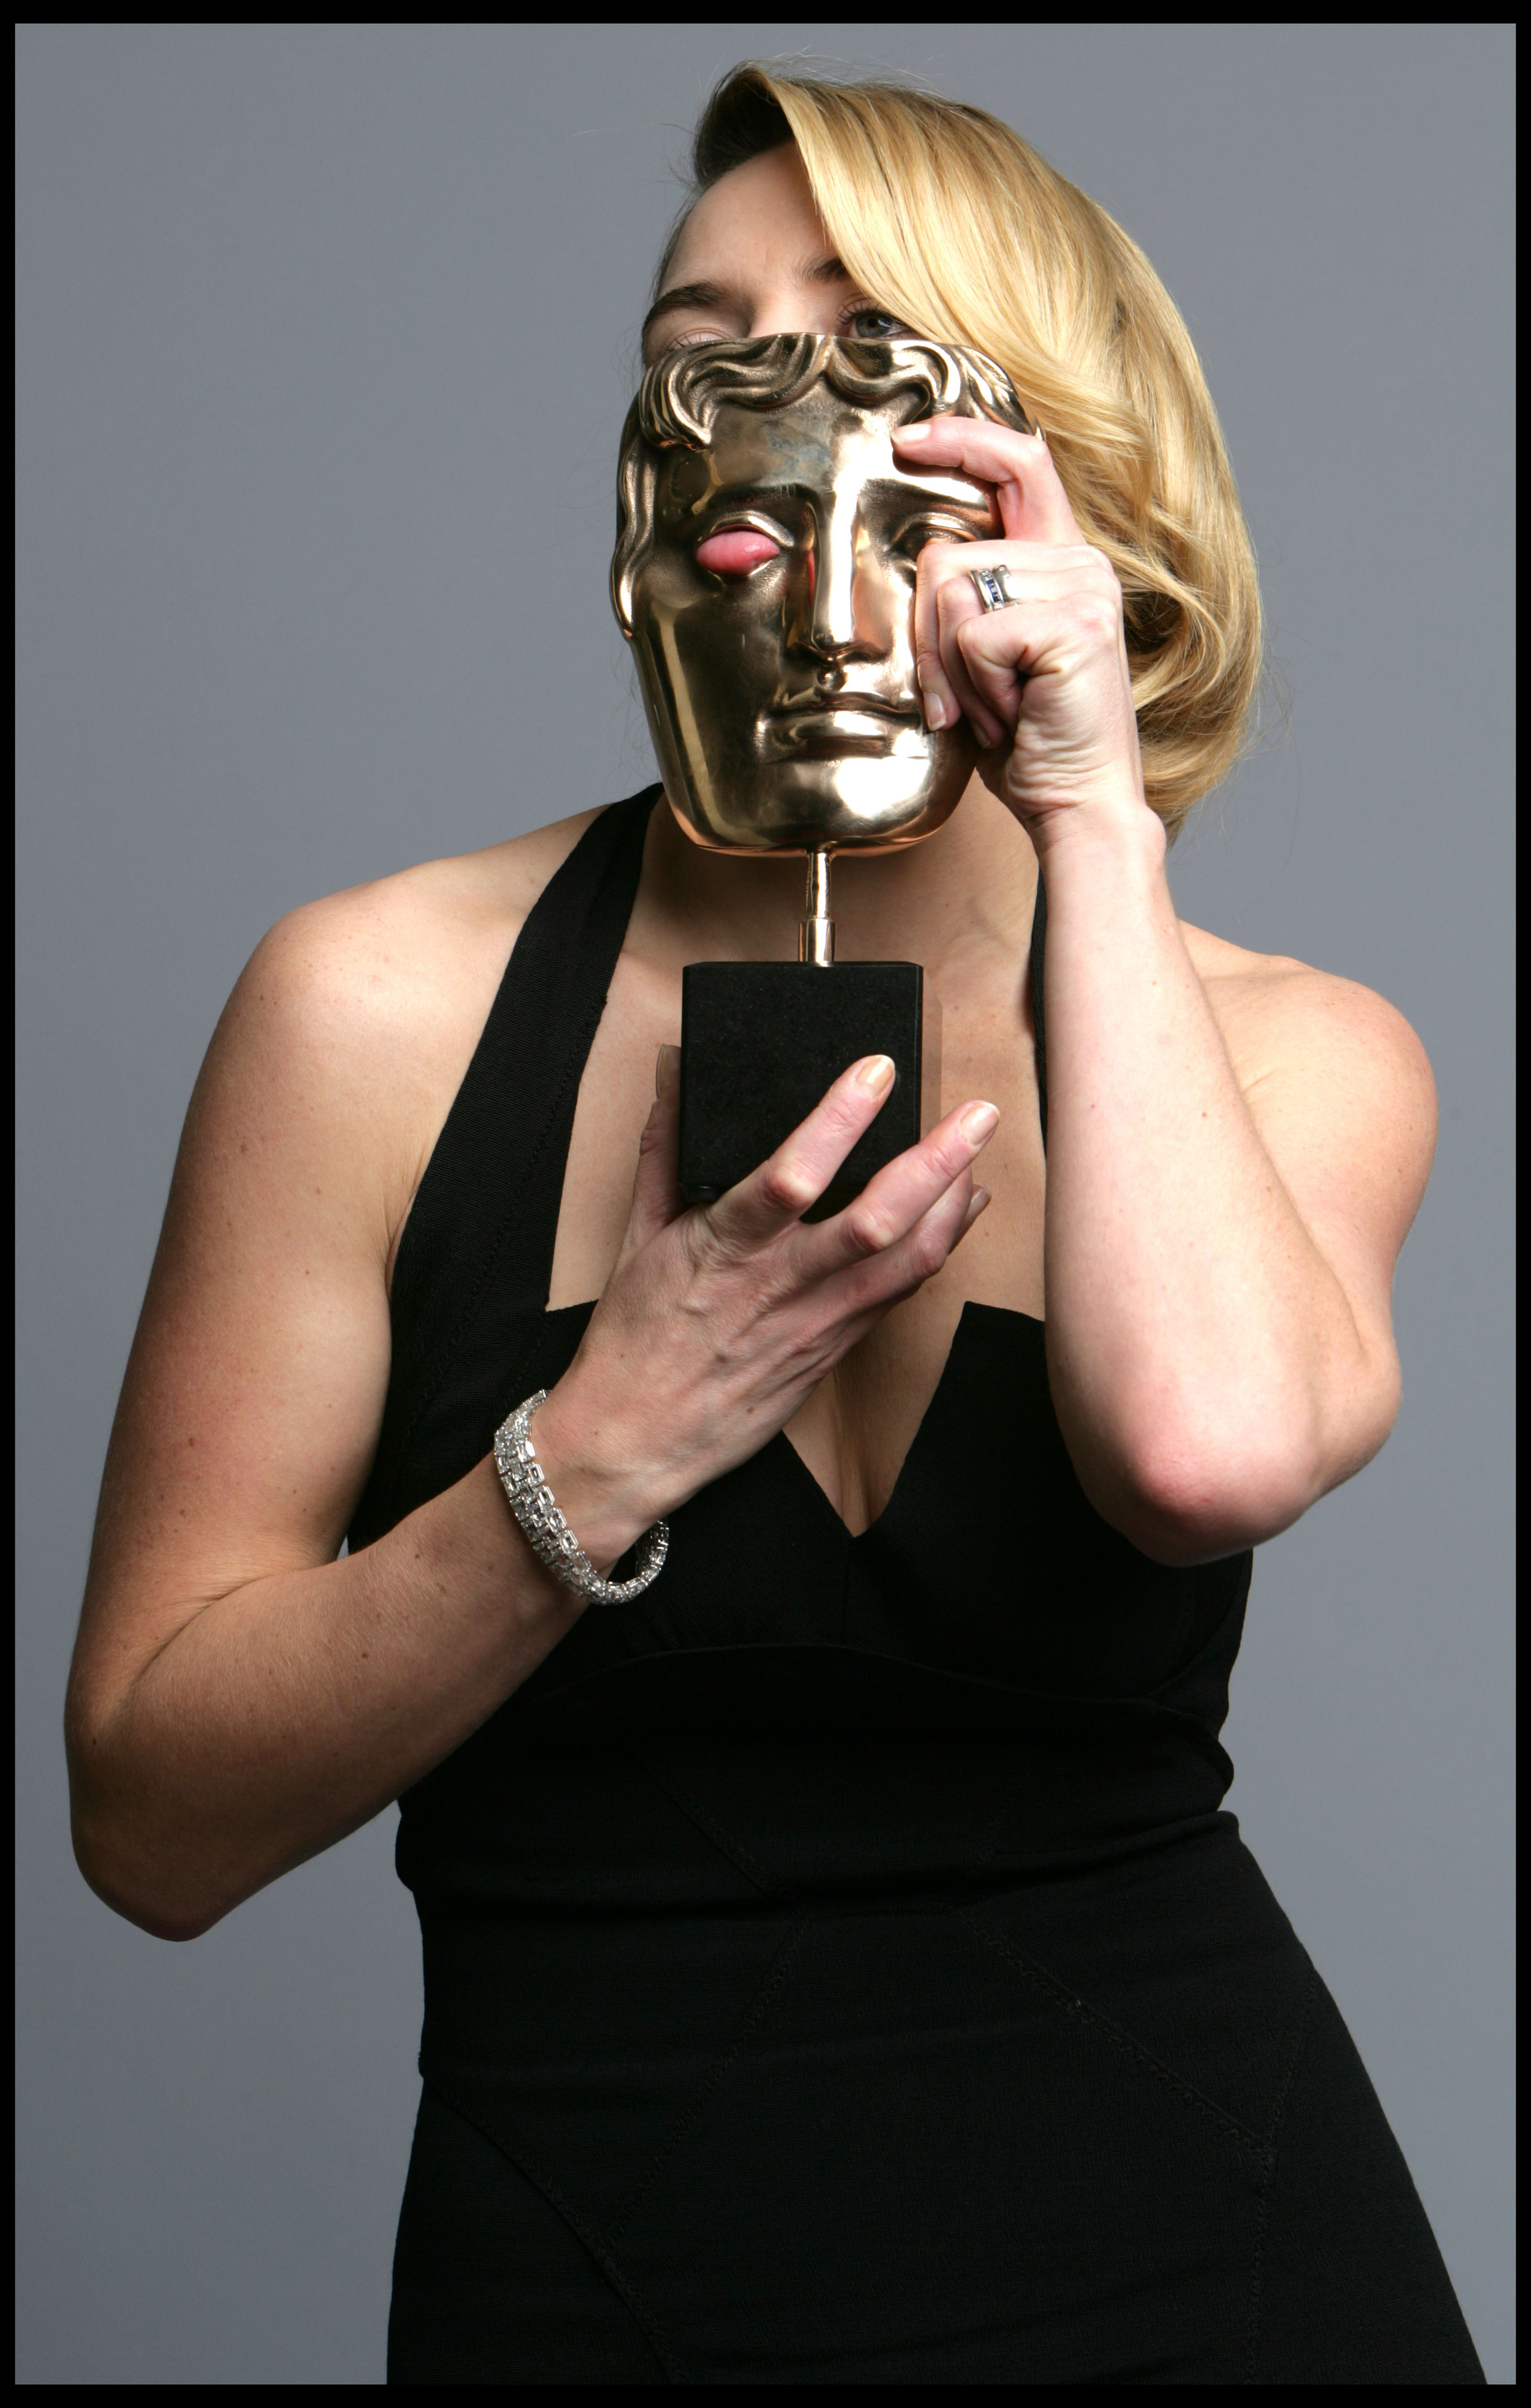 Kate Winslett, actress